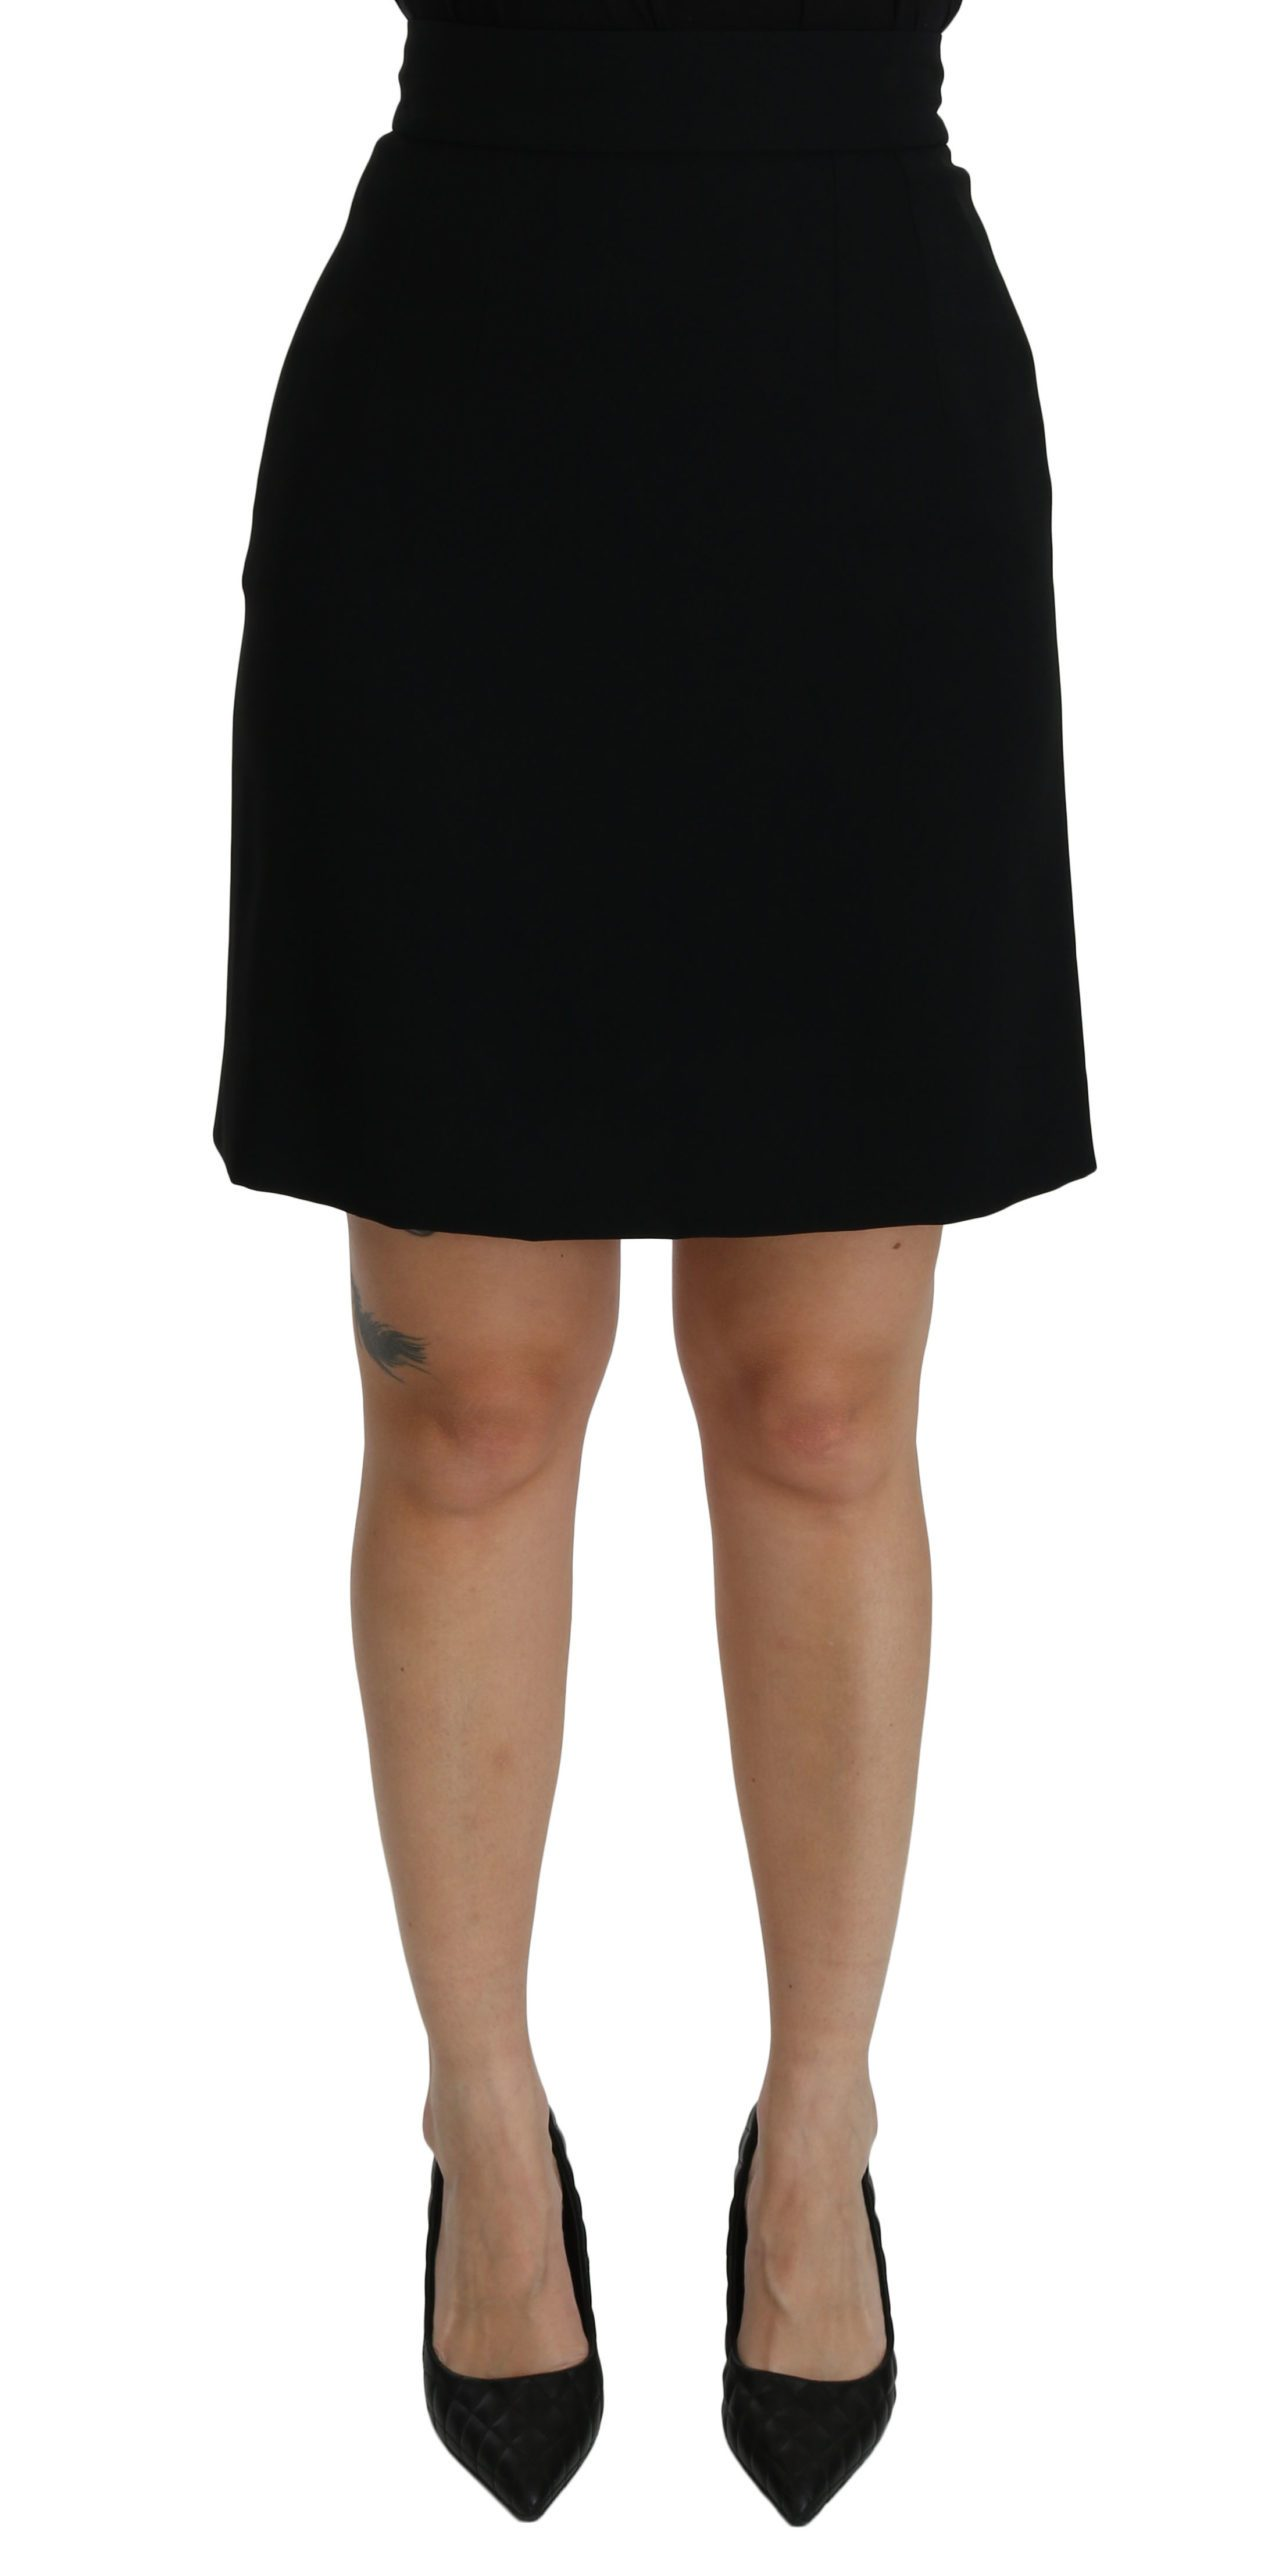 Dolce & Gabbana Women's Mermaid High Waist Midi Skirt Black SKI1388 - IT40 S